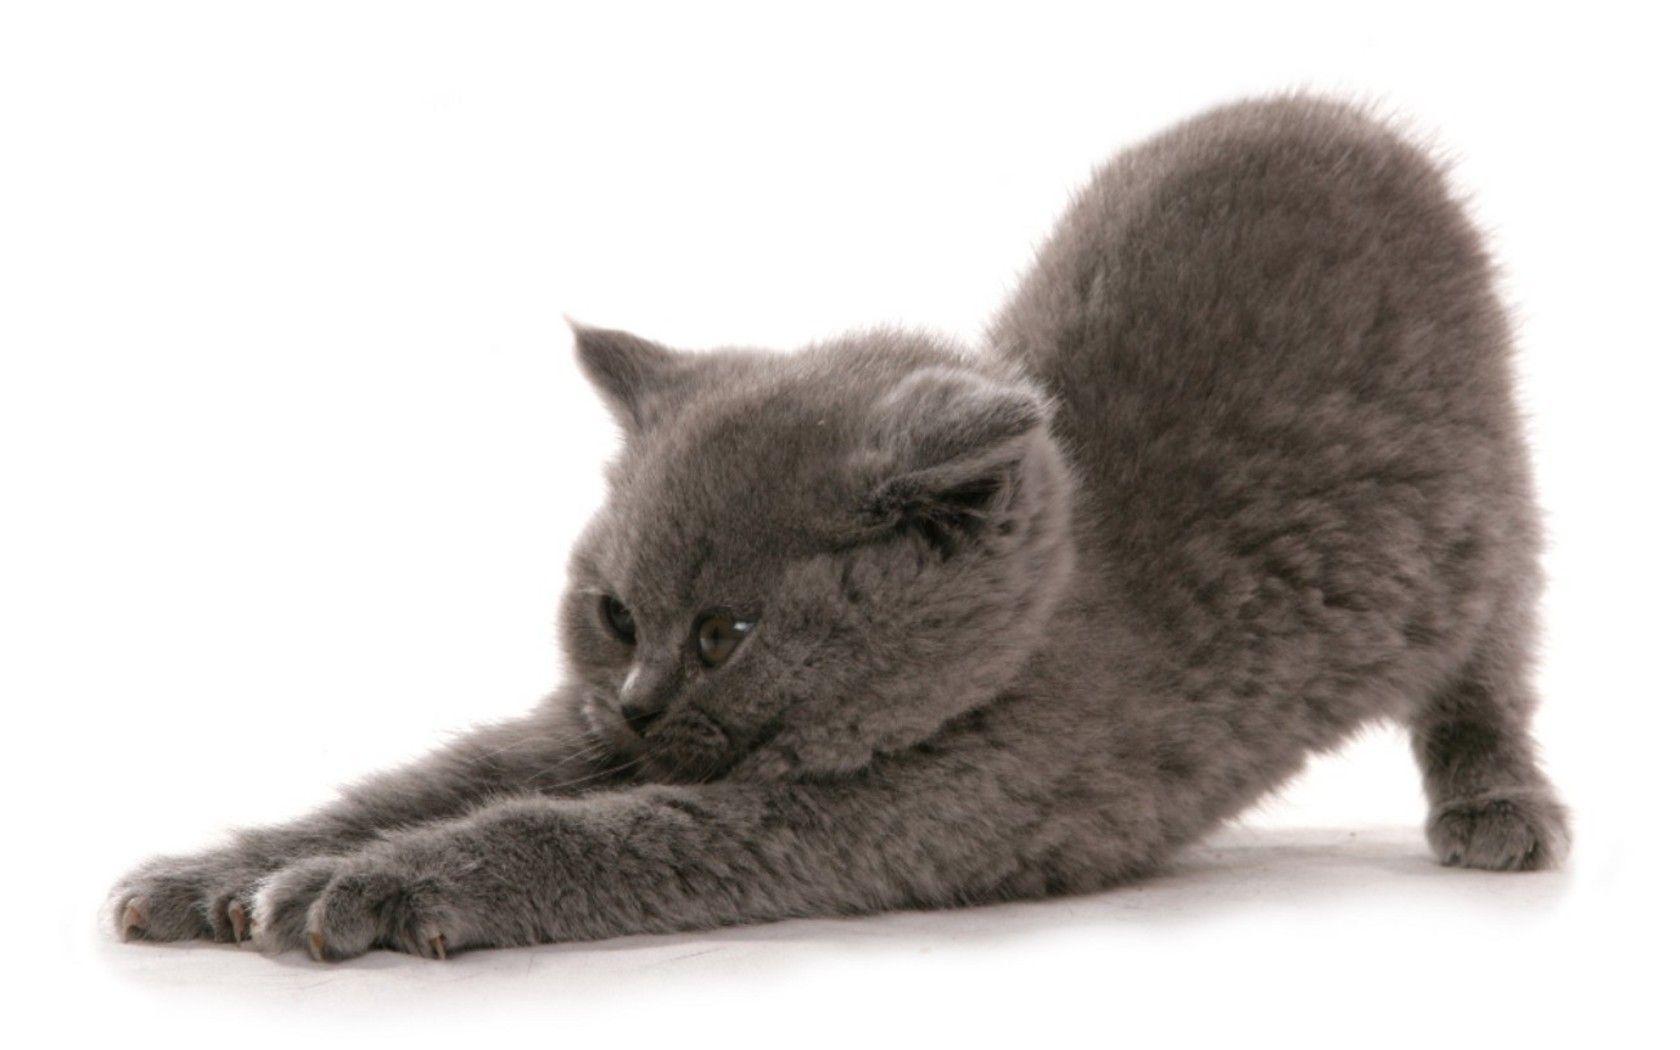 Funny British Shorthair Kitten Photo And Wallpaper Beautiful